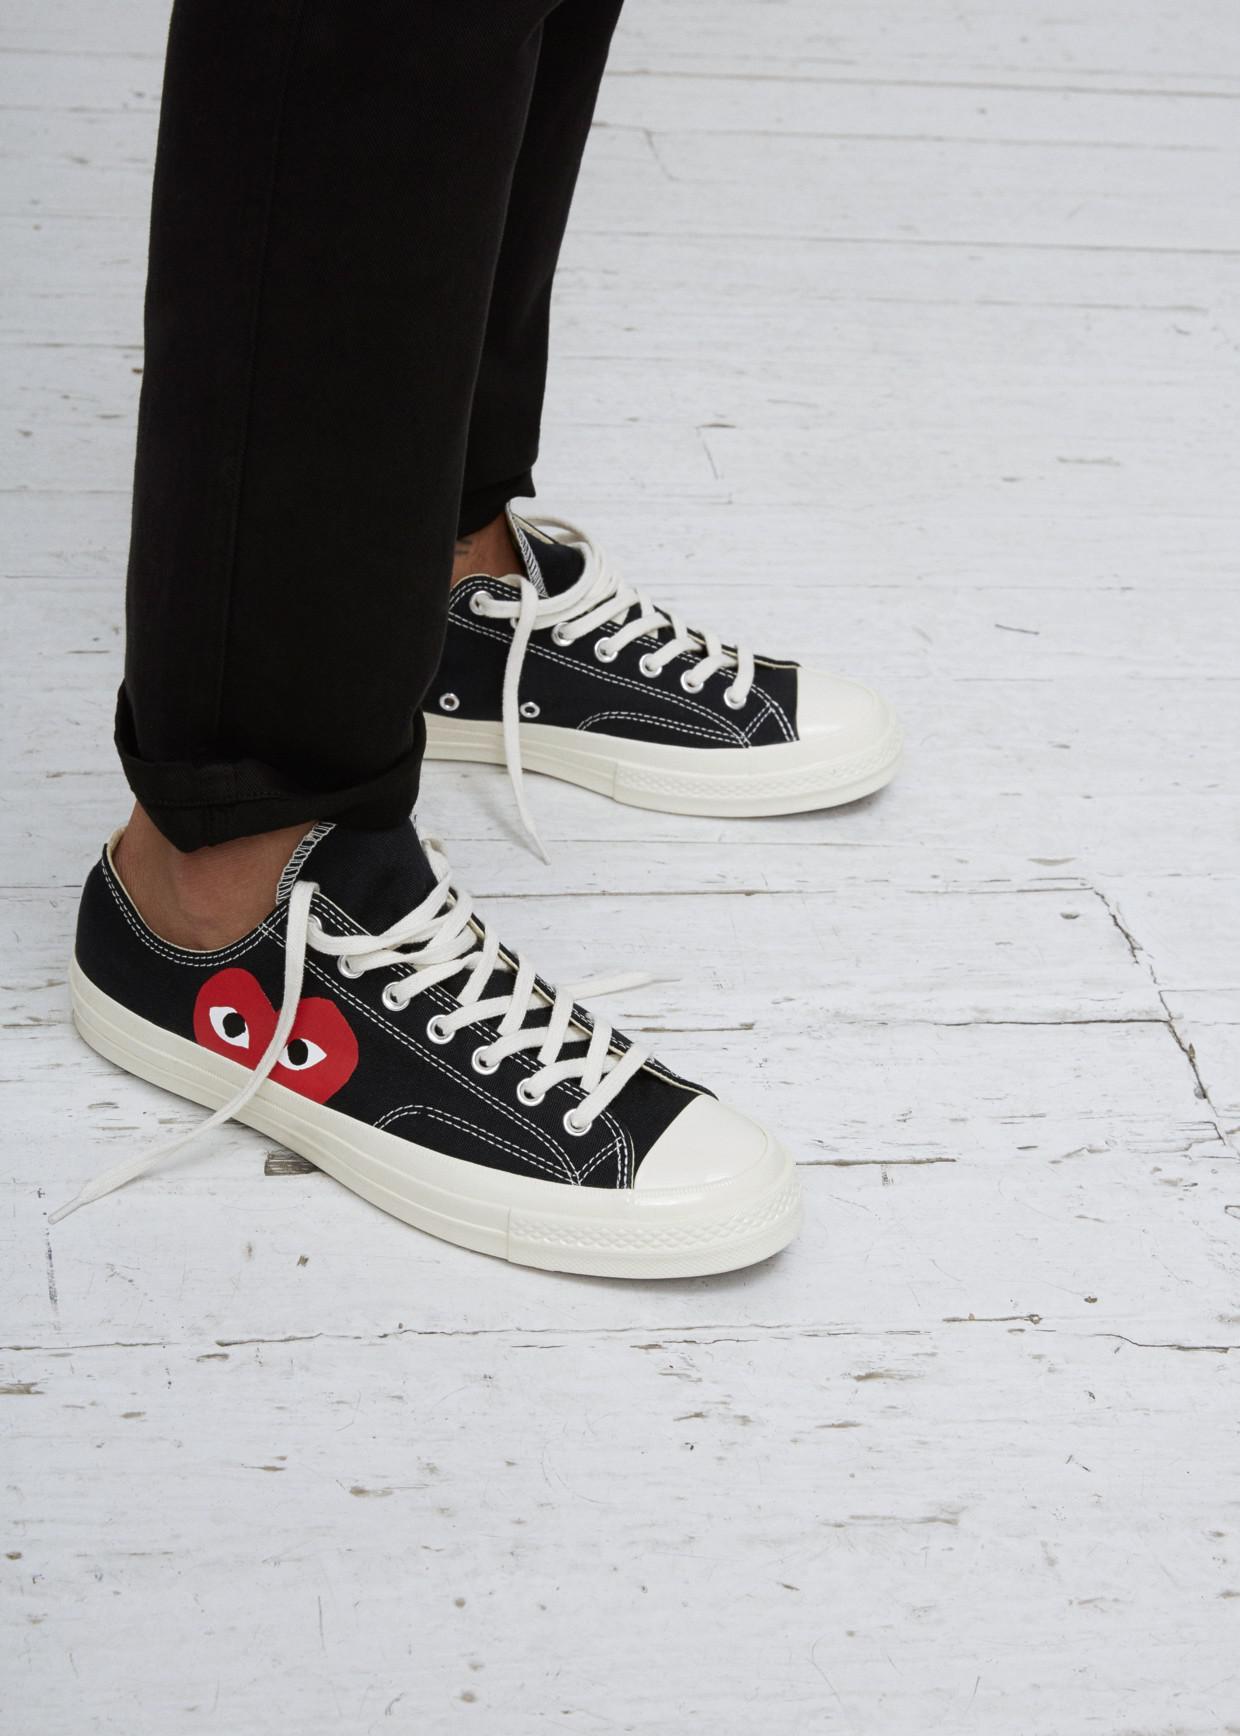 0cb588feab1 ... Black Play Converse Chuck Taylor Low-top Sneaker for Men. View  fullscreen